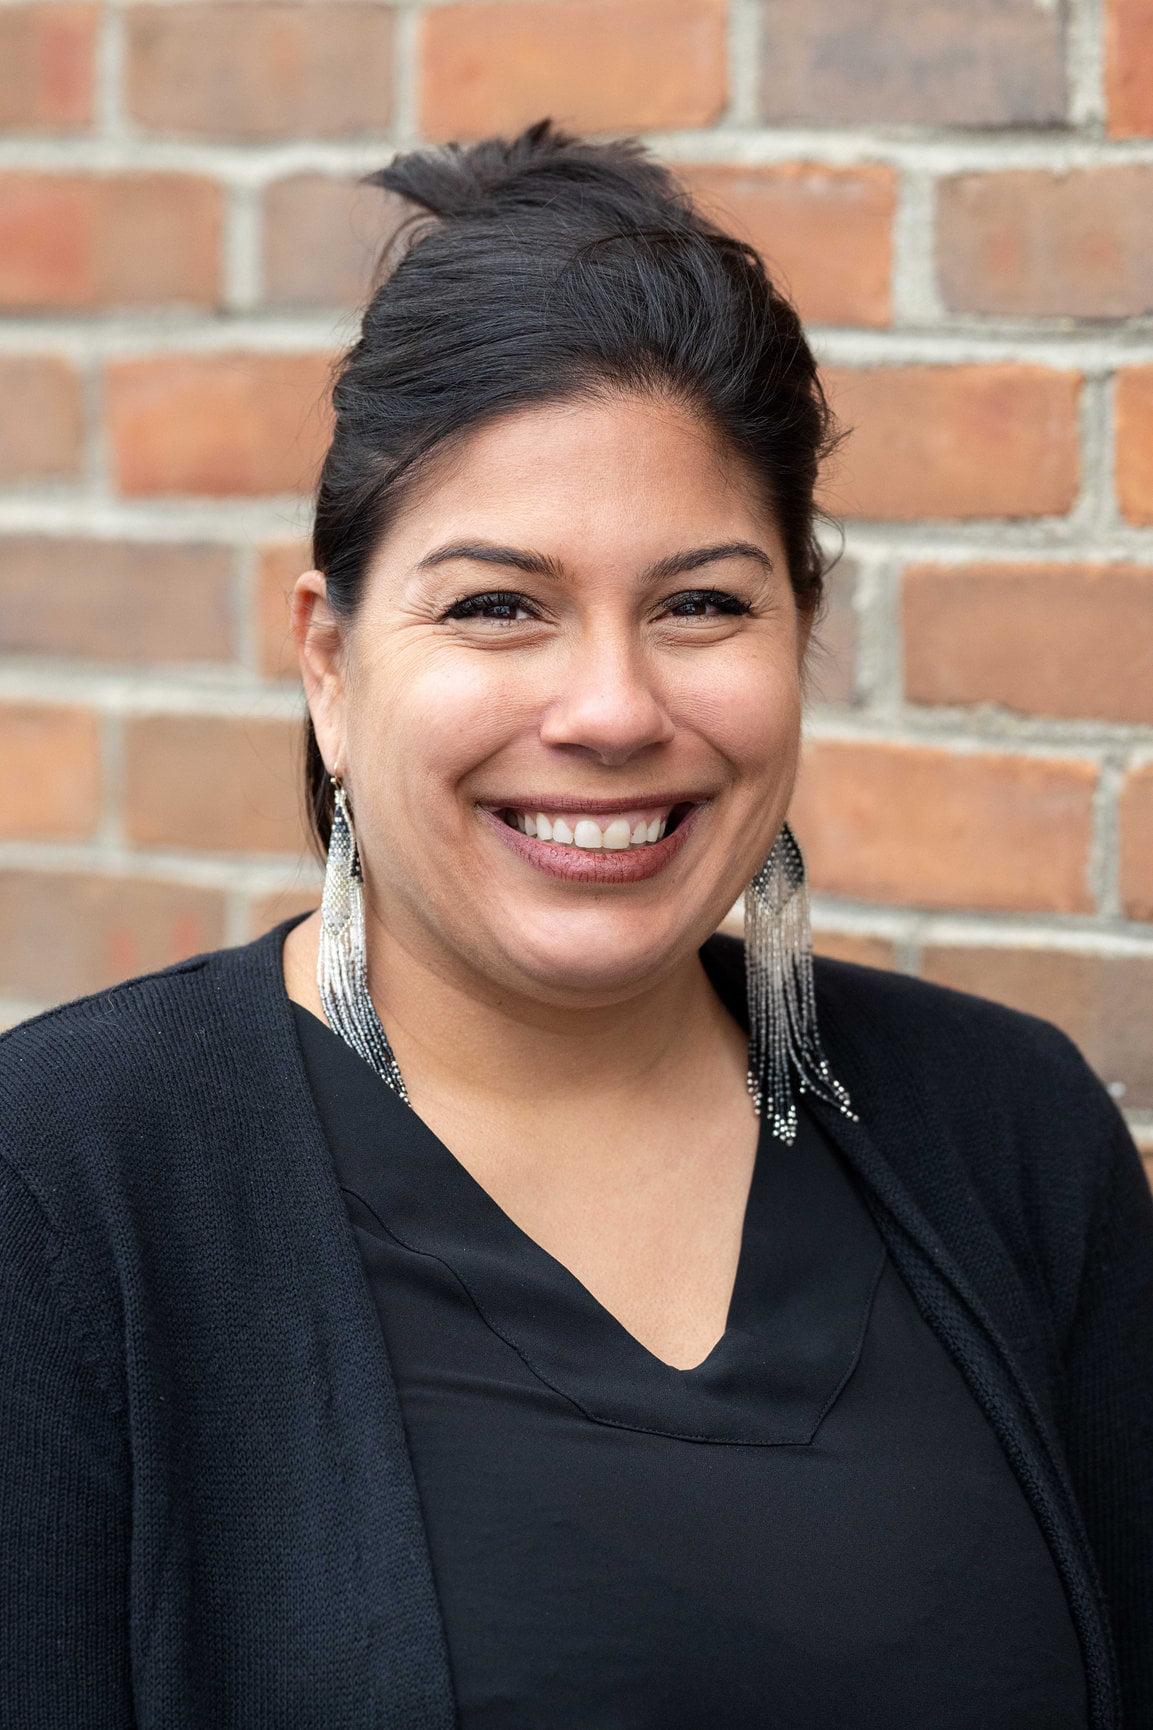 Kelly Guarasci Johnston